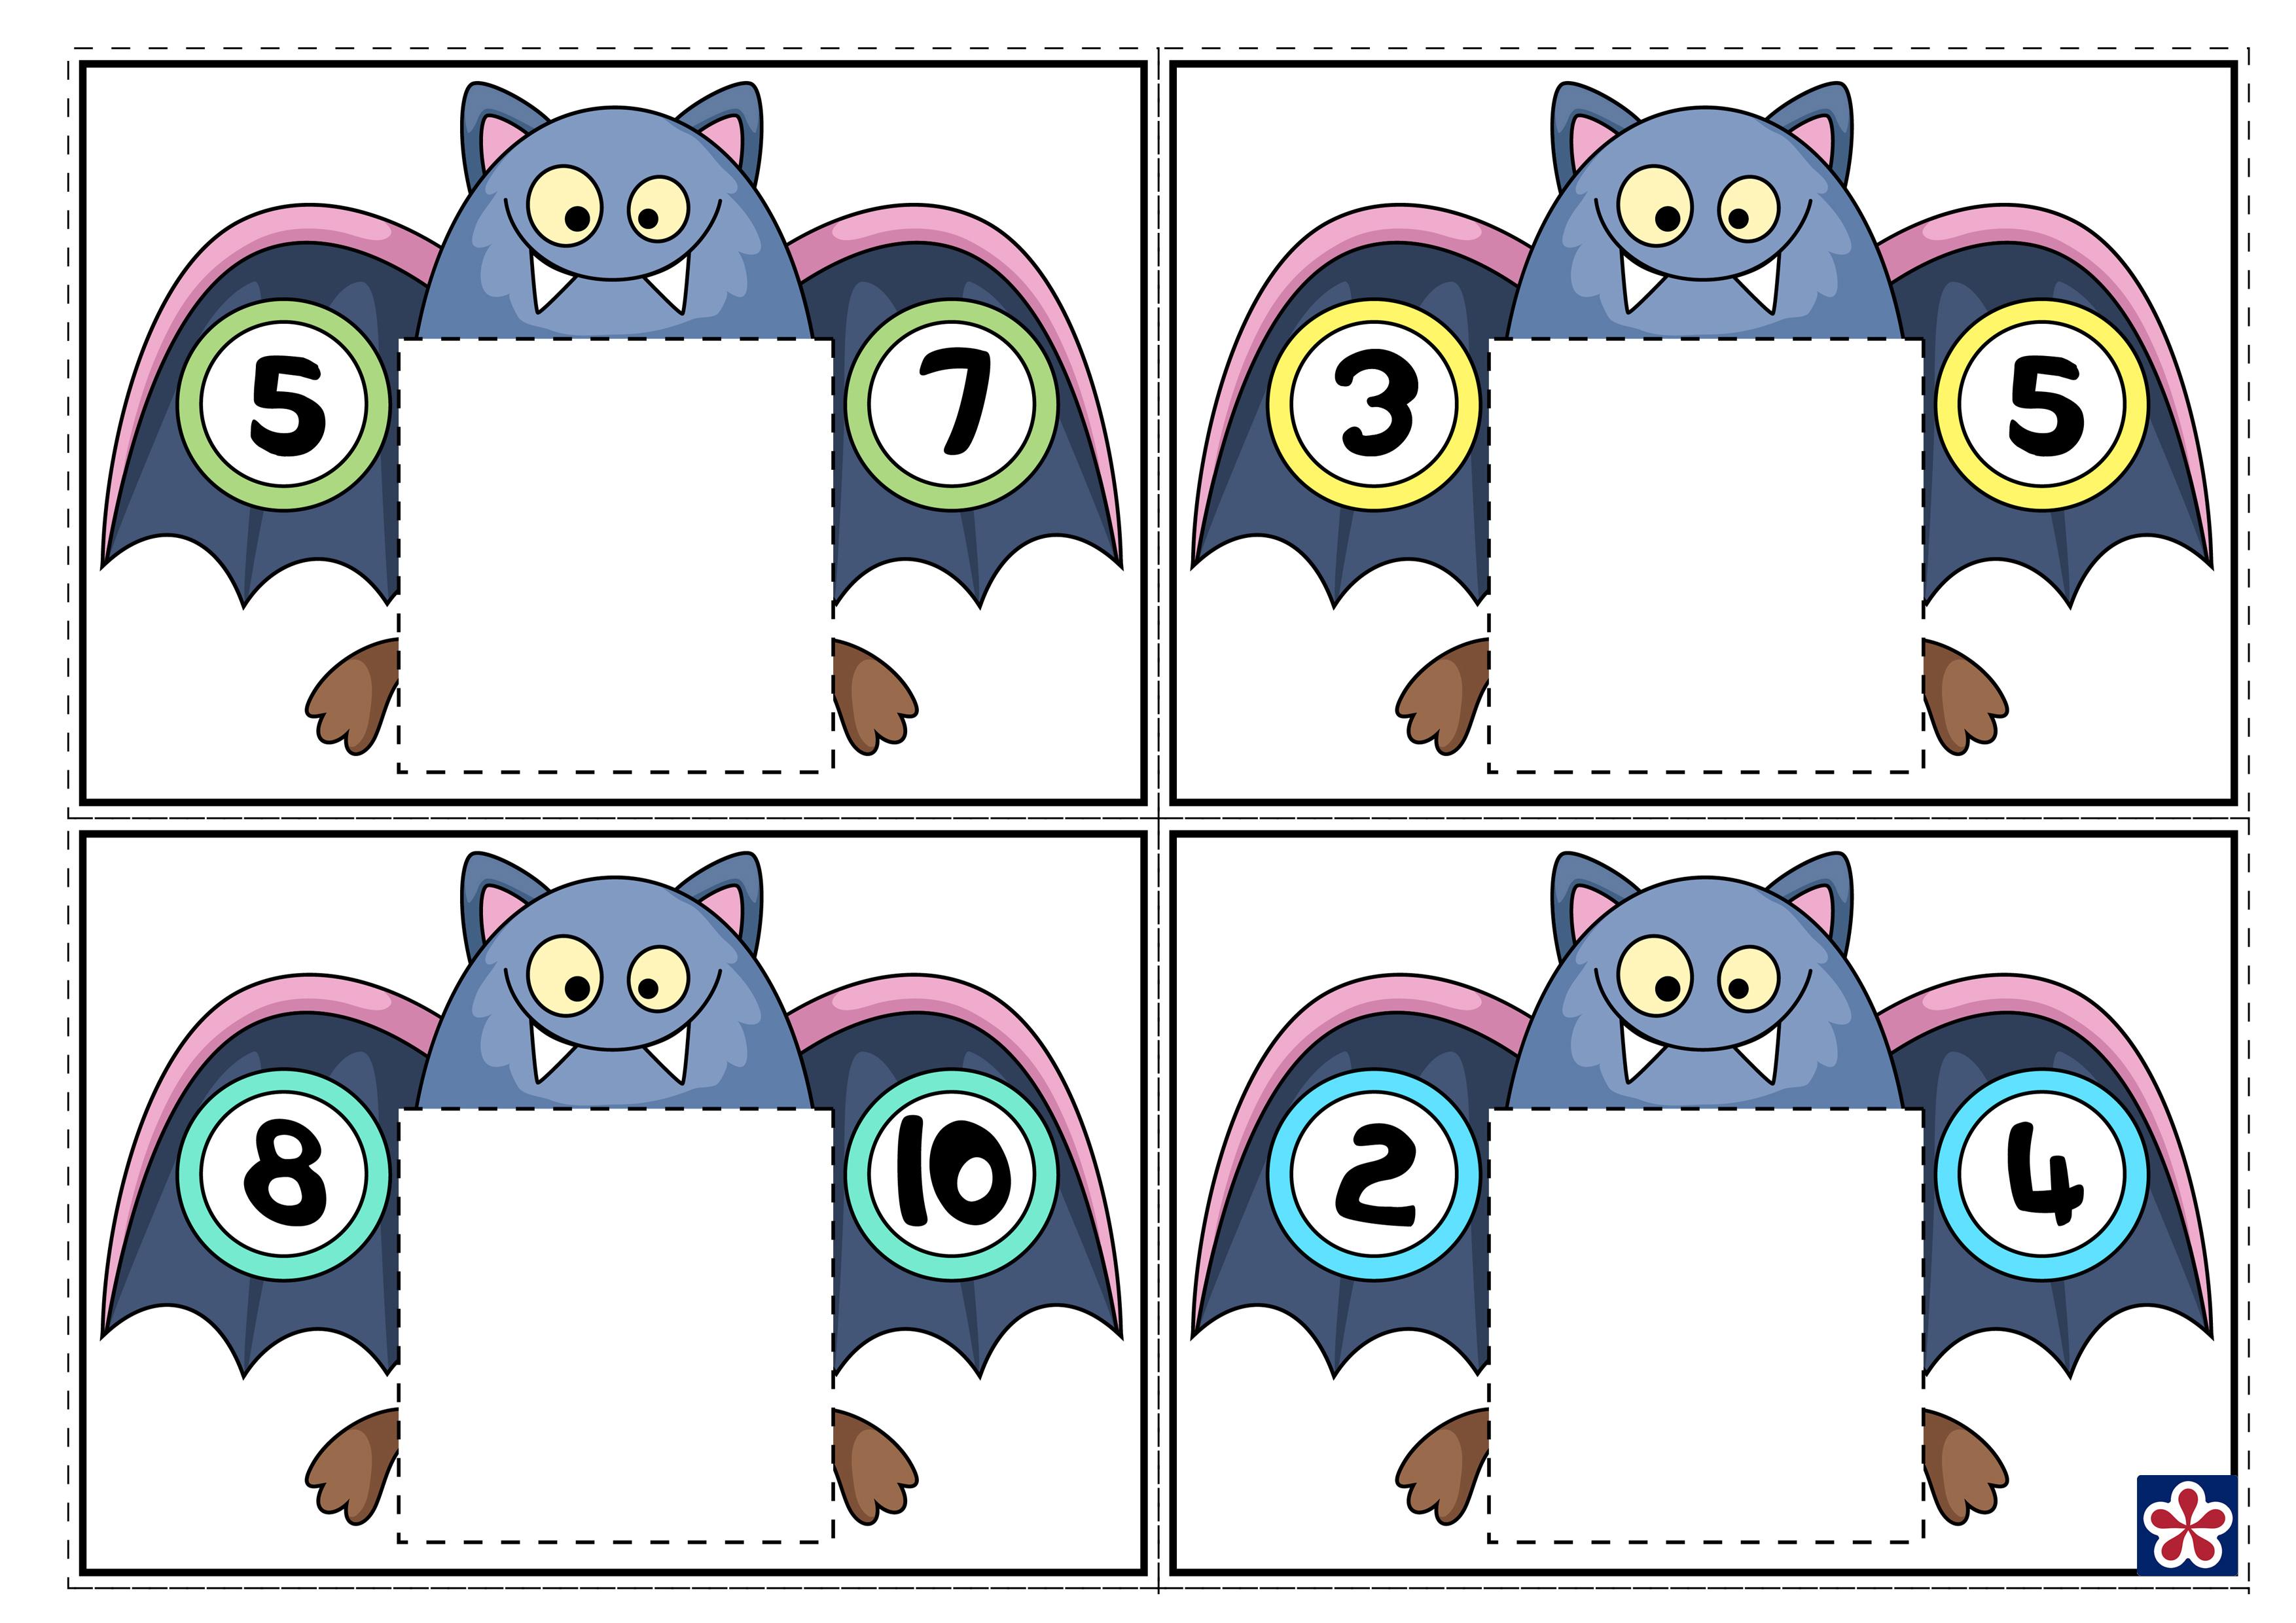 Bat Themed Counting Worksheets For Preschool Teachersmag